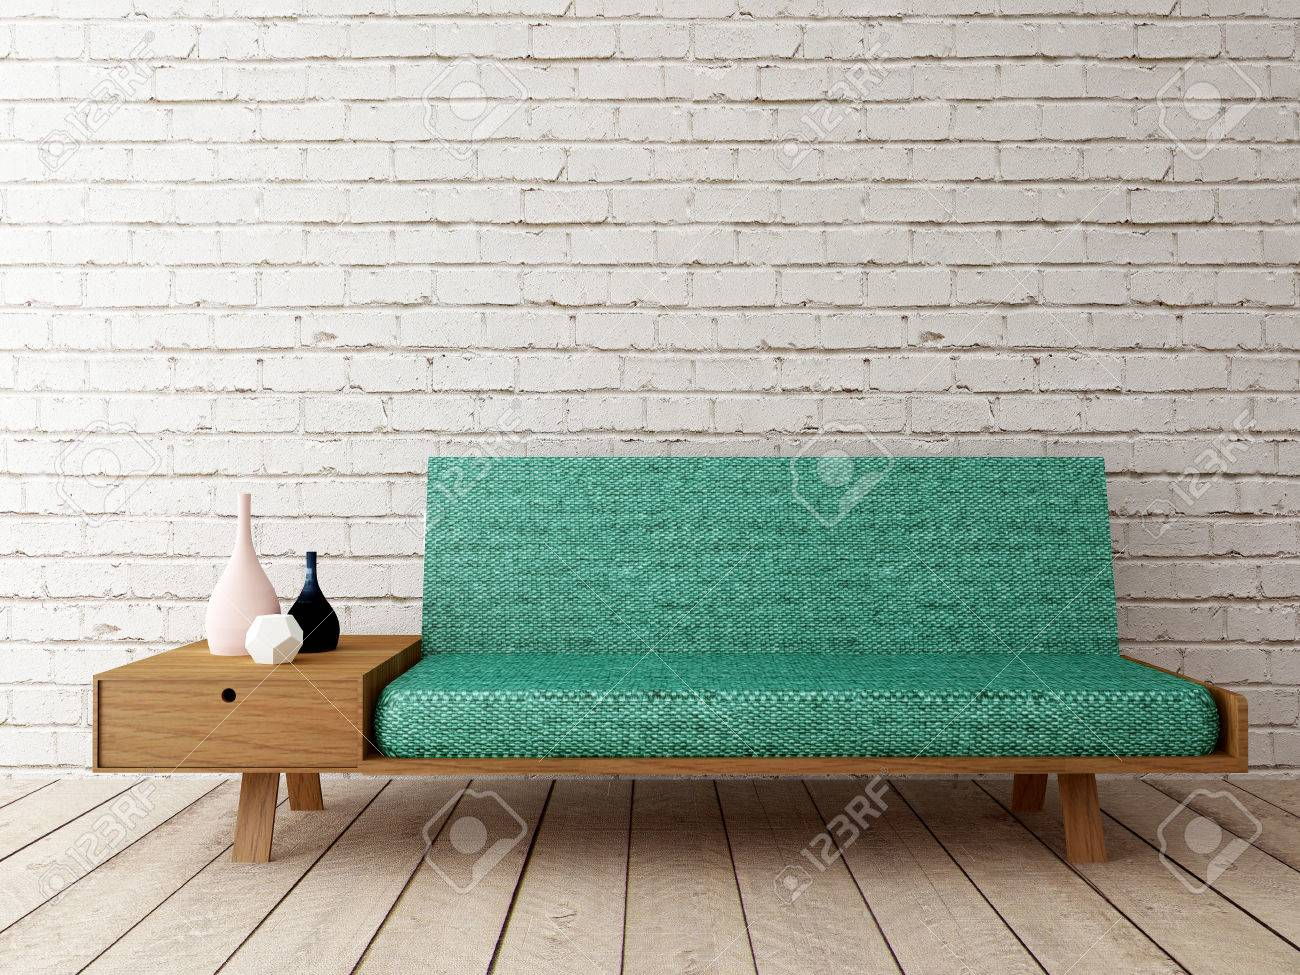 modern interior with sofa on brick wall - 51228237